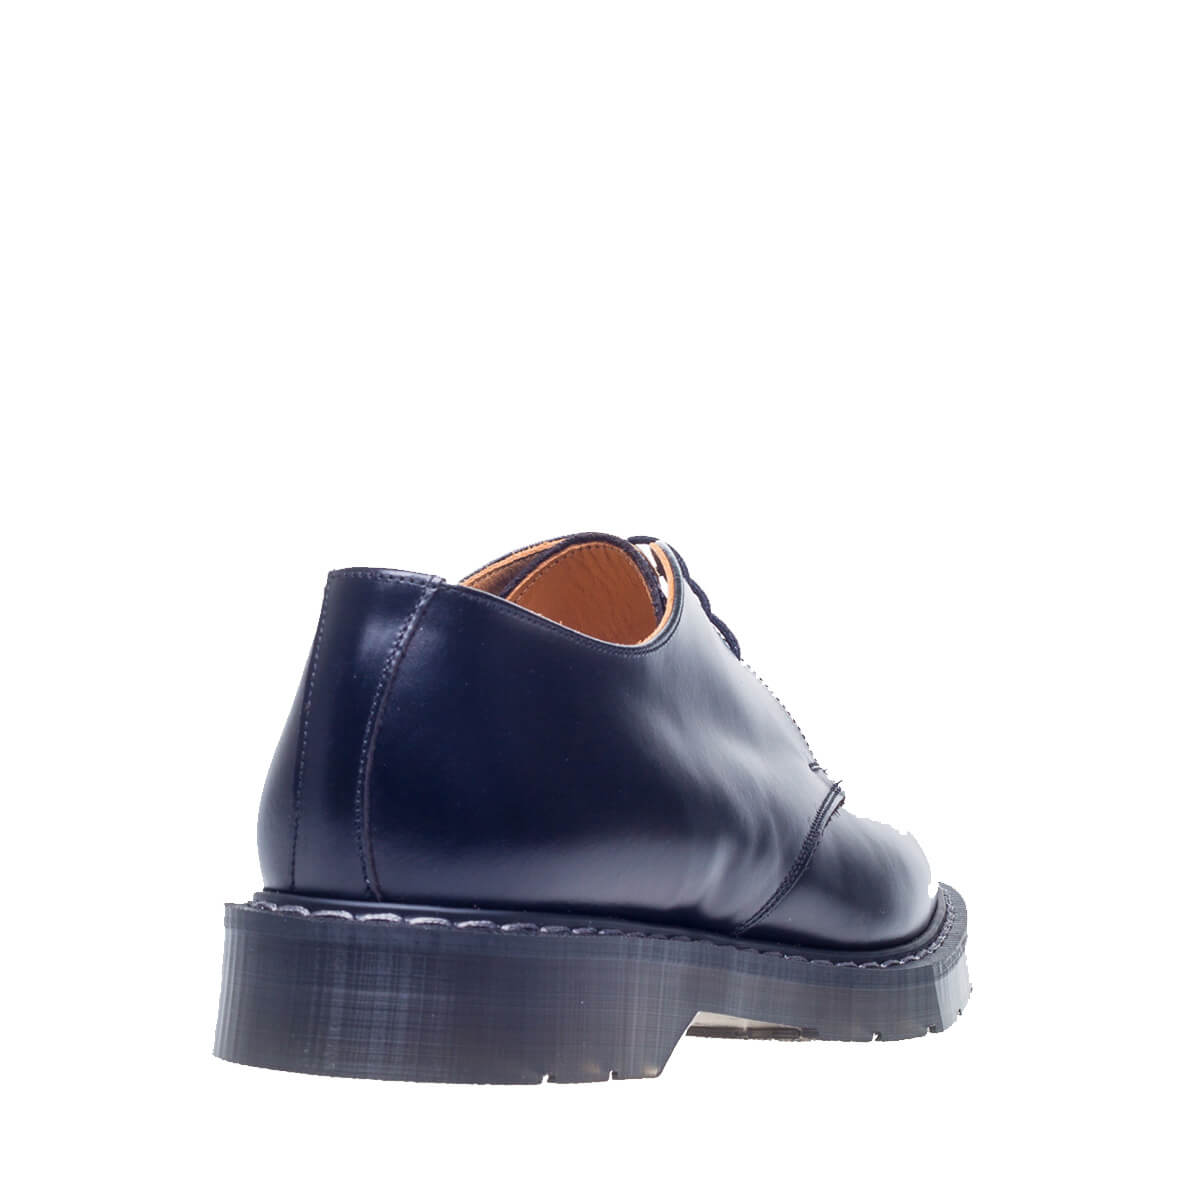 Solovair Black High Shine 3 Eye Gibson Shoe